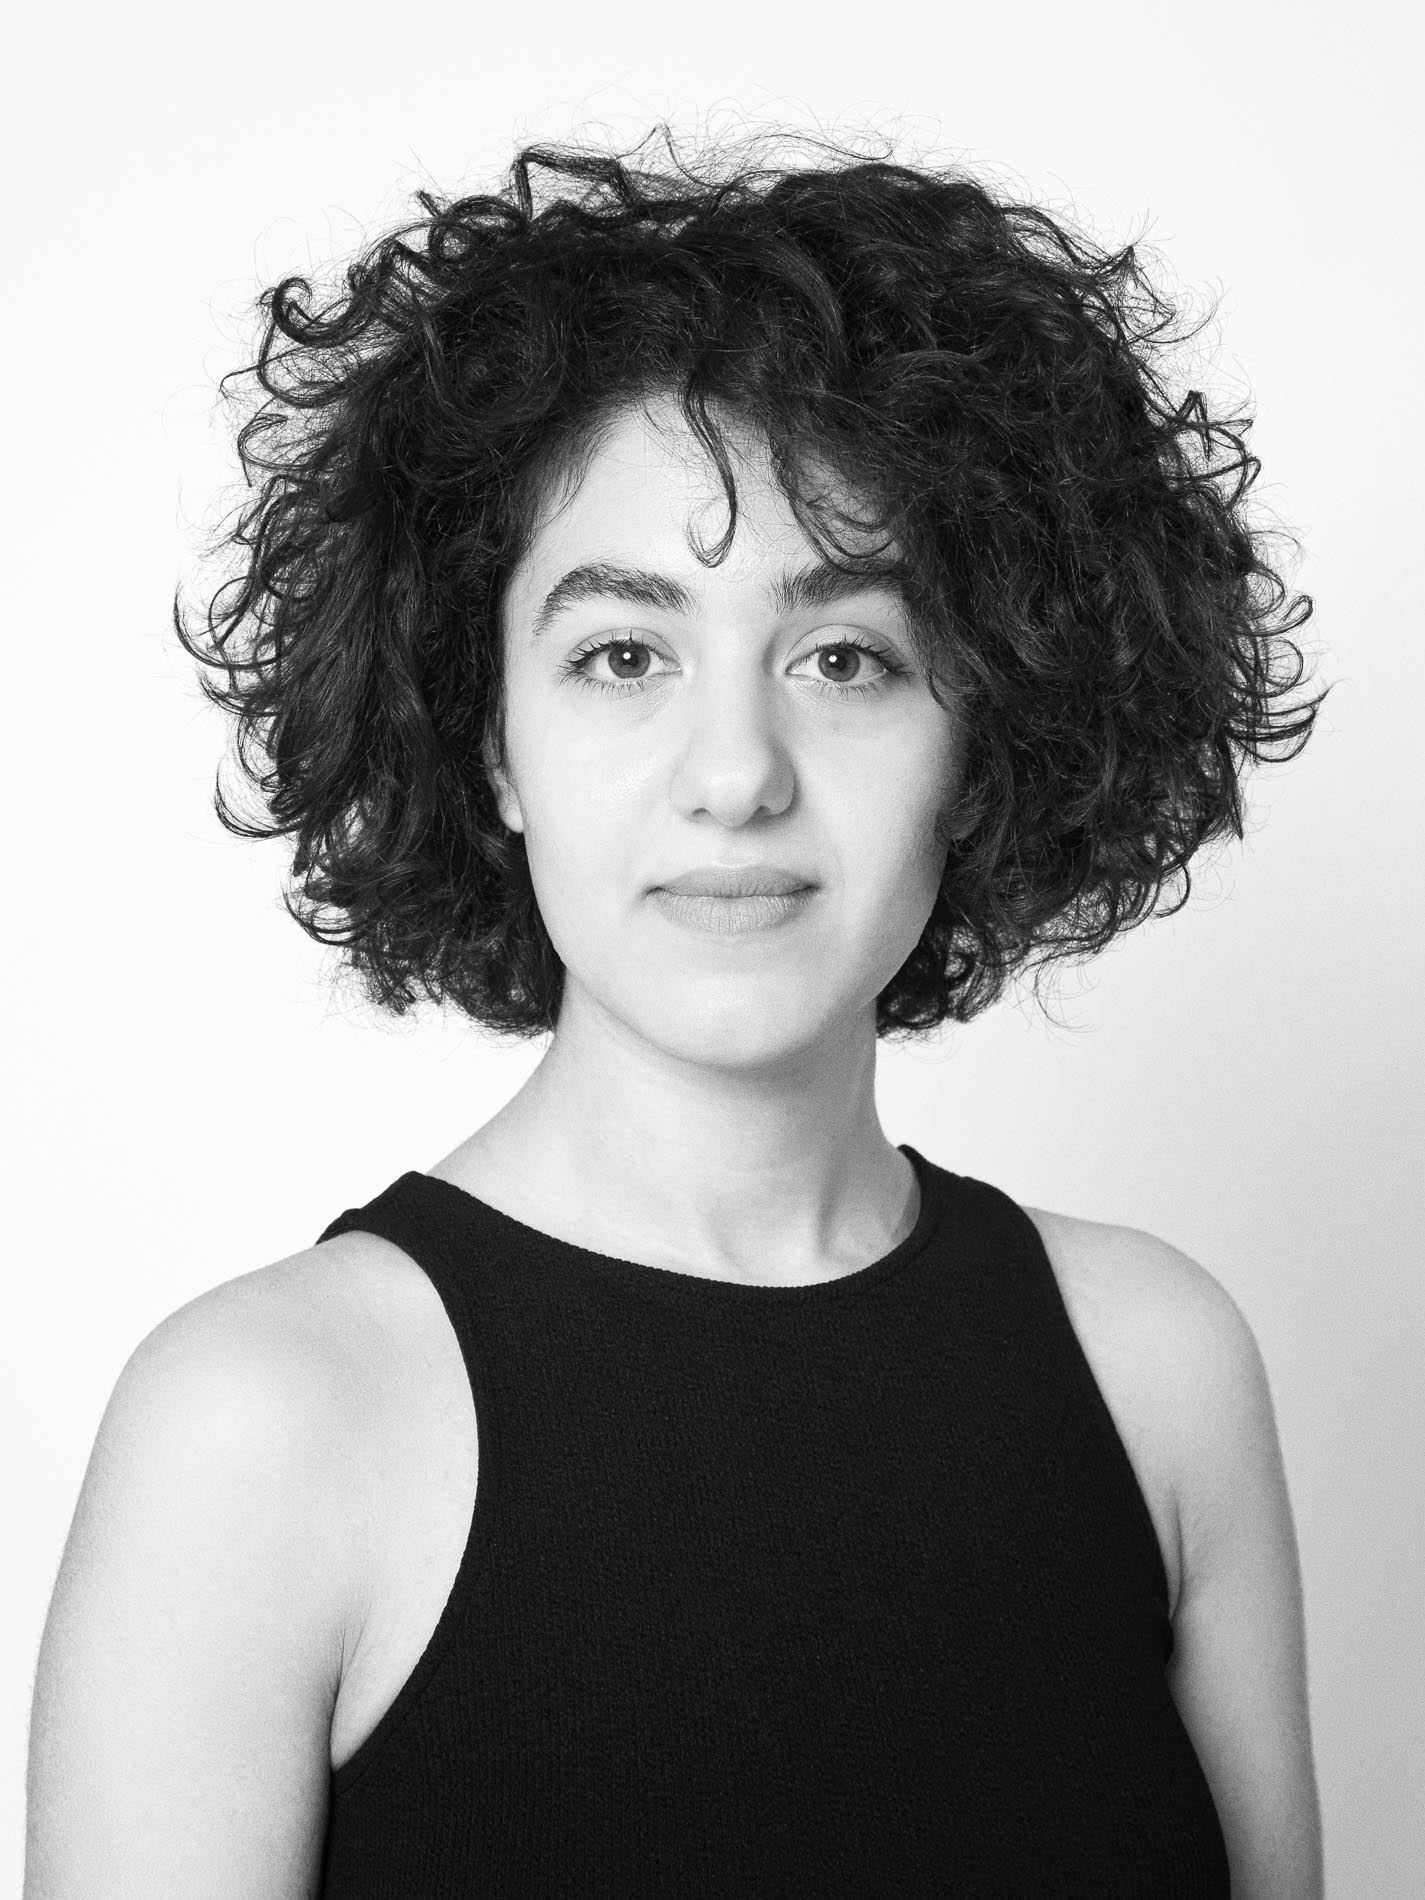 Hanna Georgis